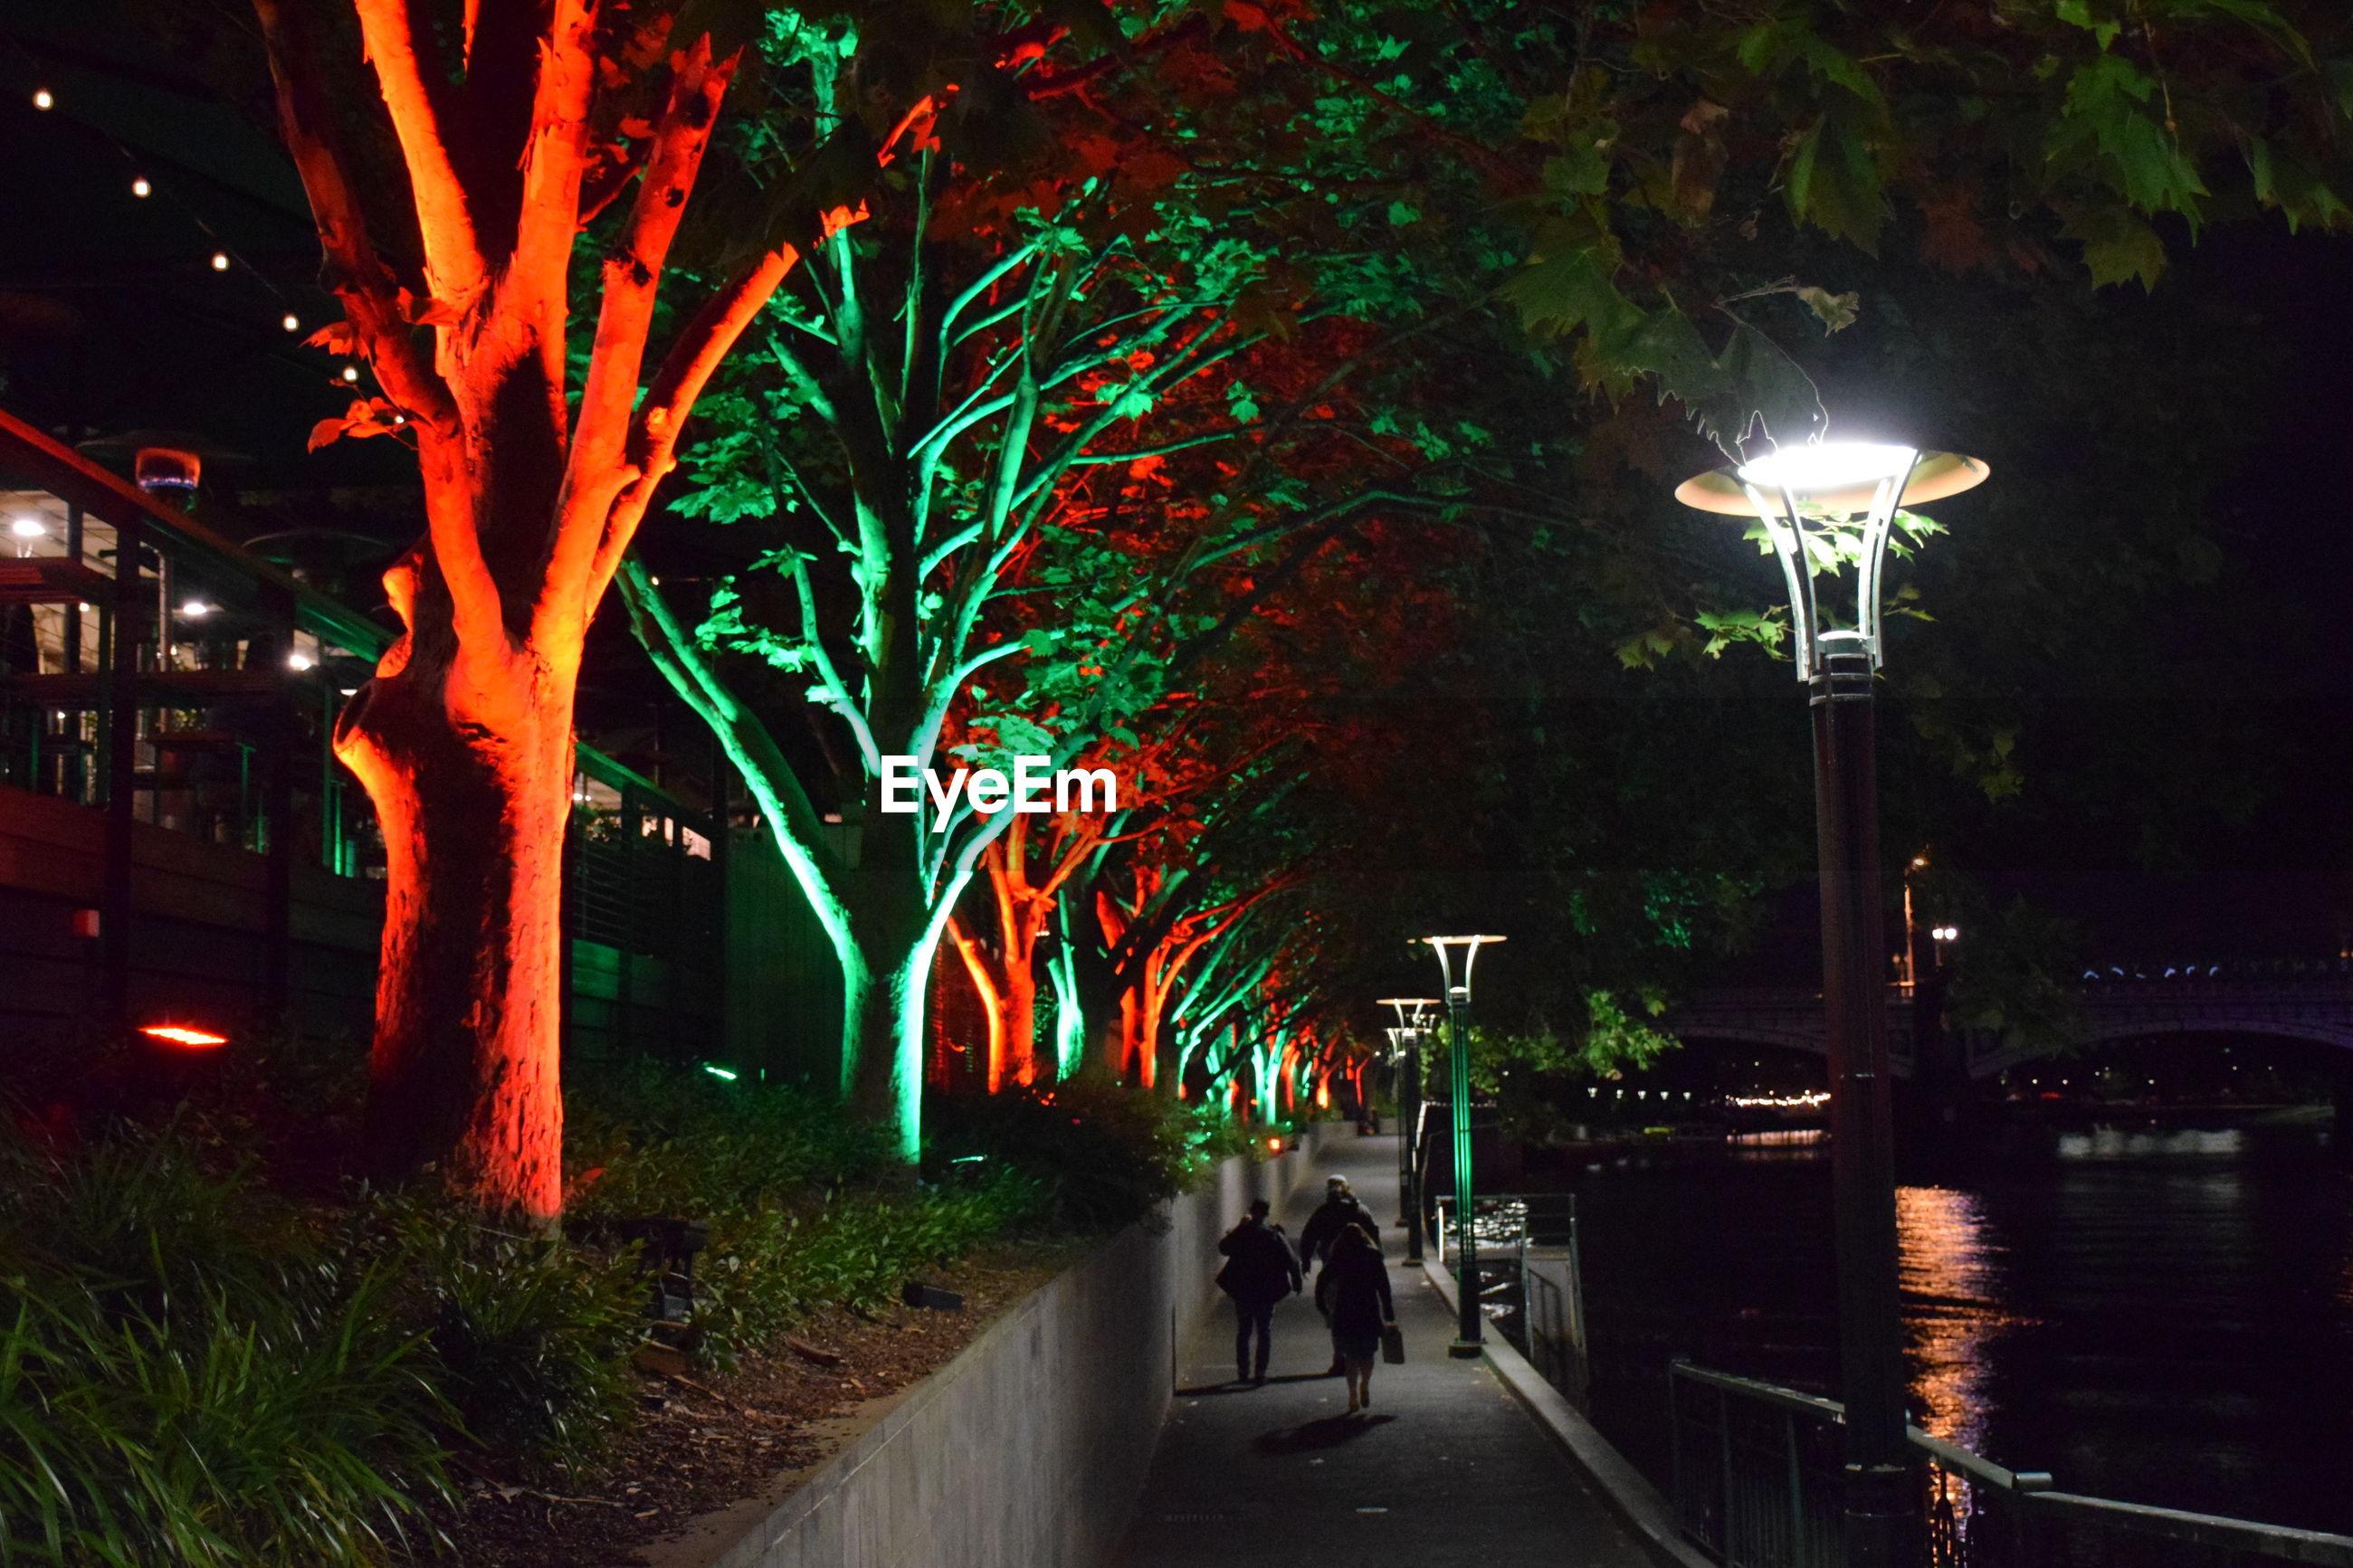 ILLUMINATED STREET LIGHT BY TREES IN CITY AT NIGHT